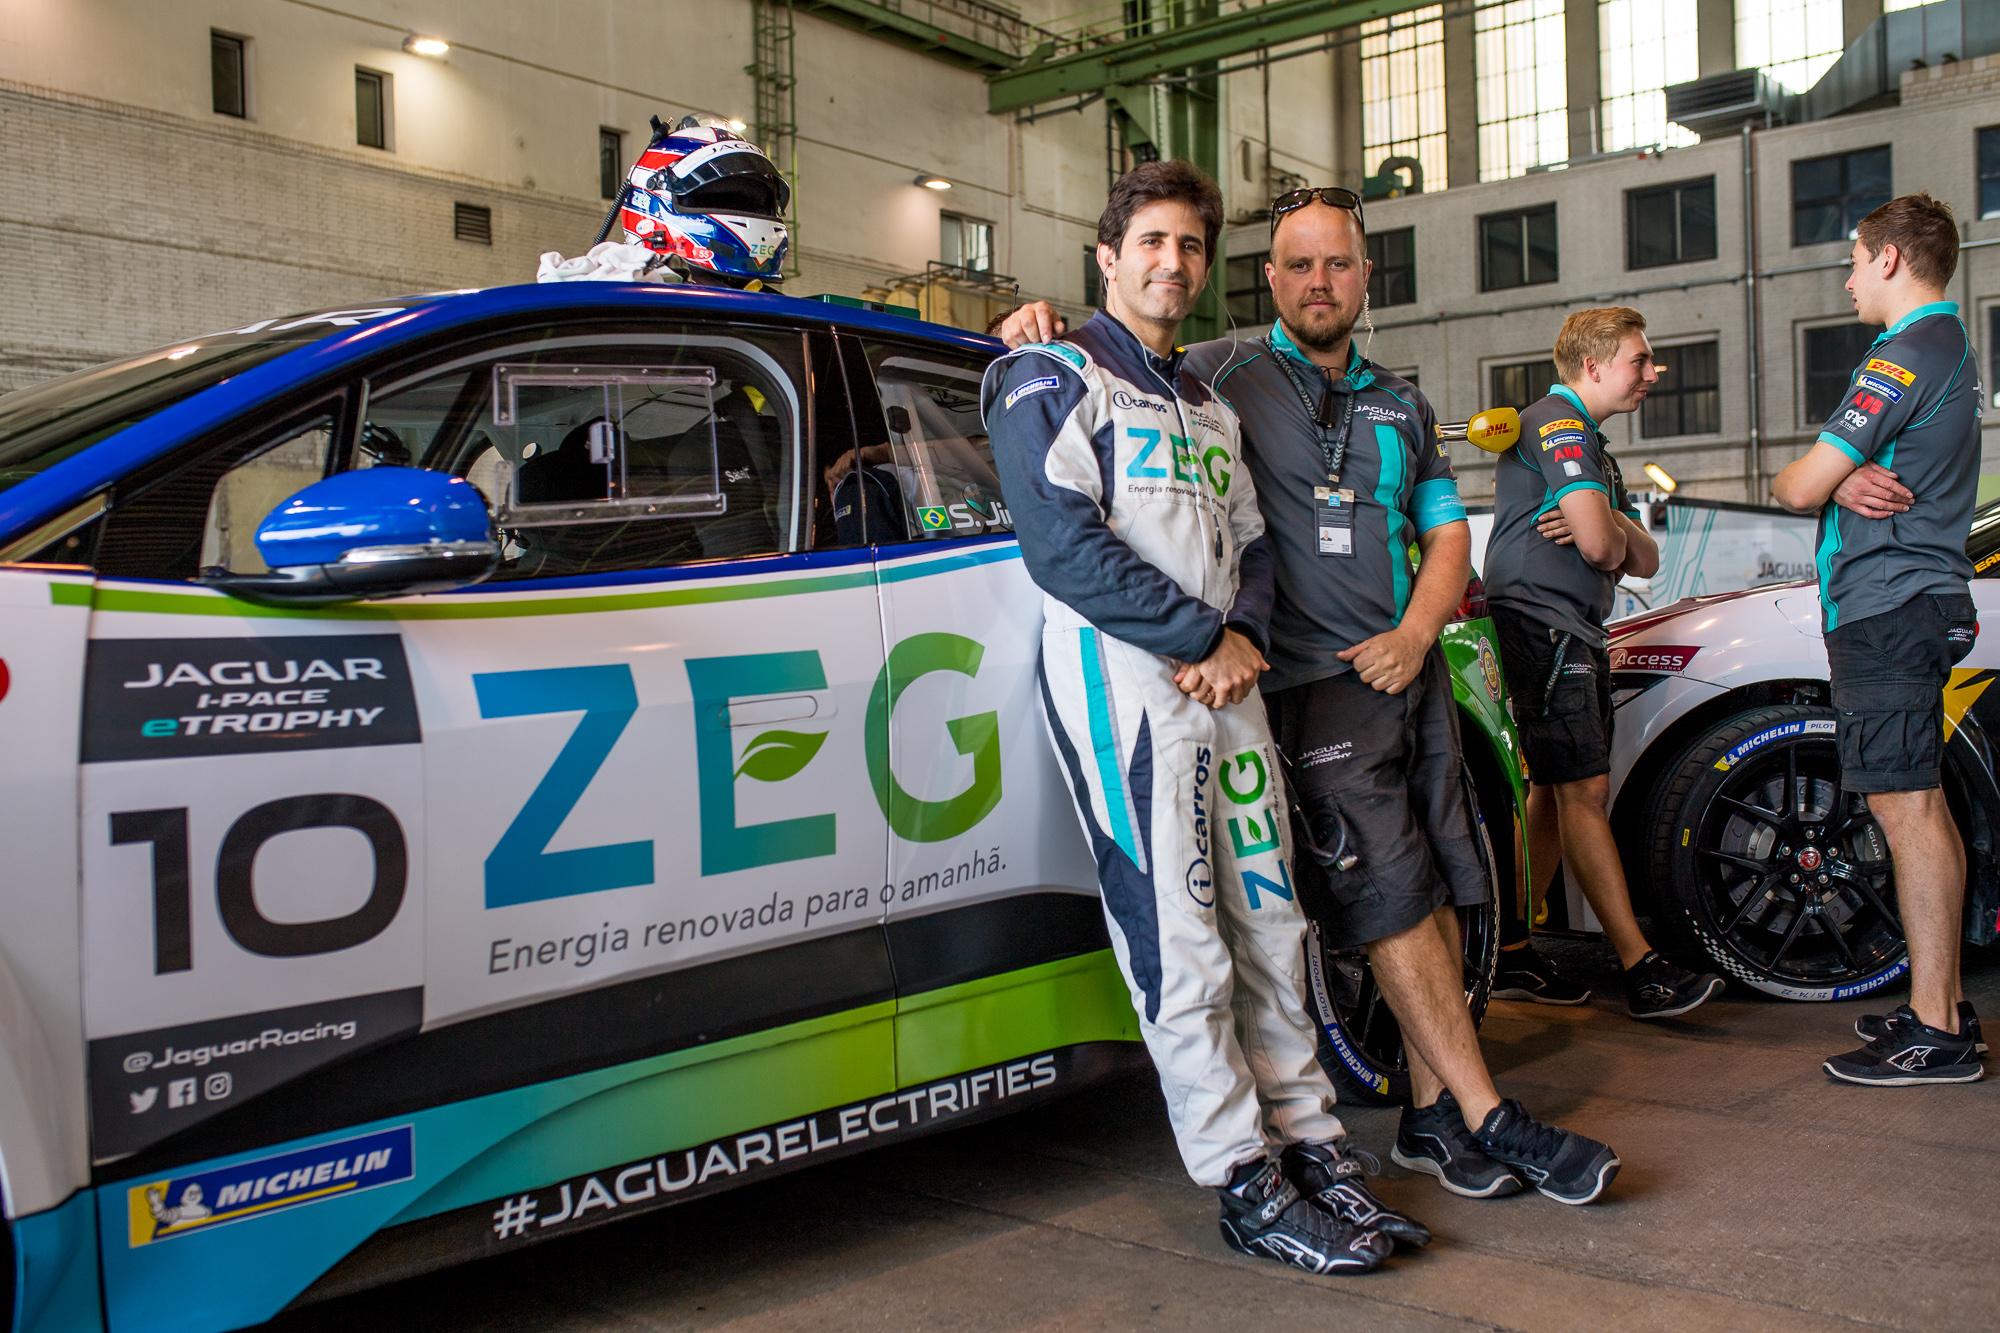 Jaguar_8.Berlin_josemariodias_02014